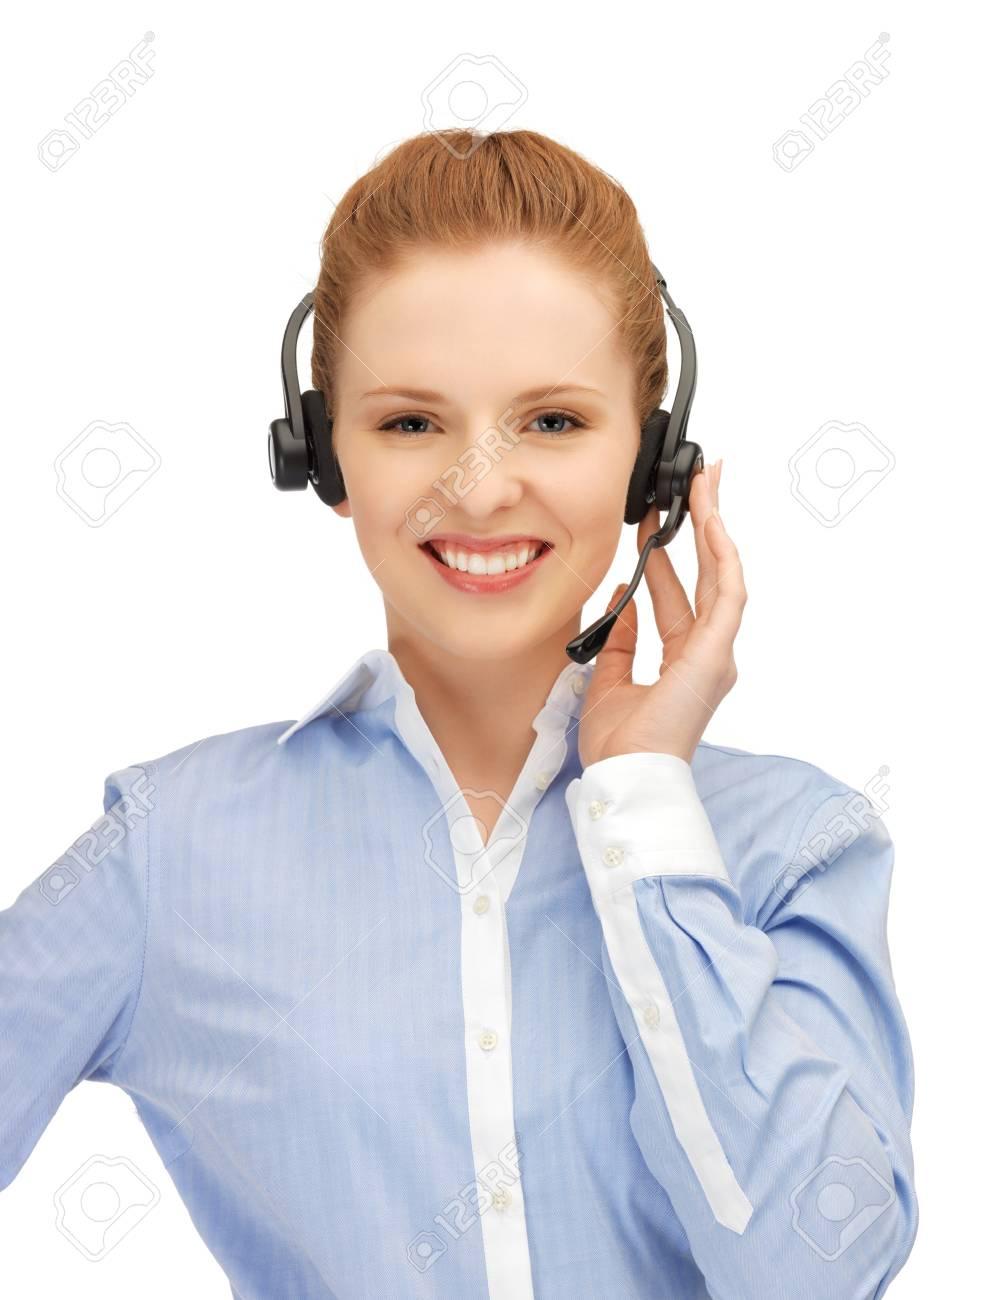 bright picture of friendly female helpline operator Stock Photo - 14333113